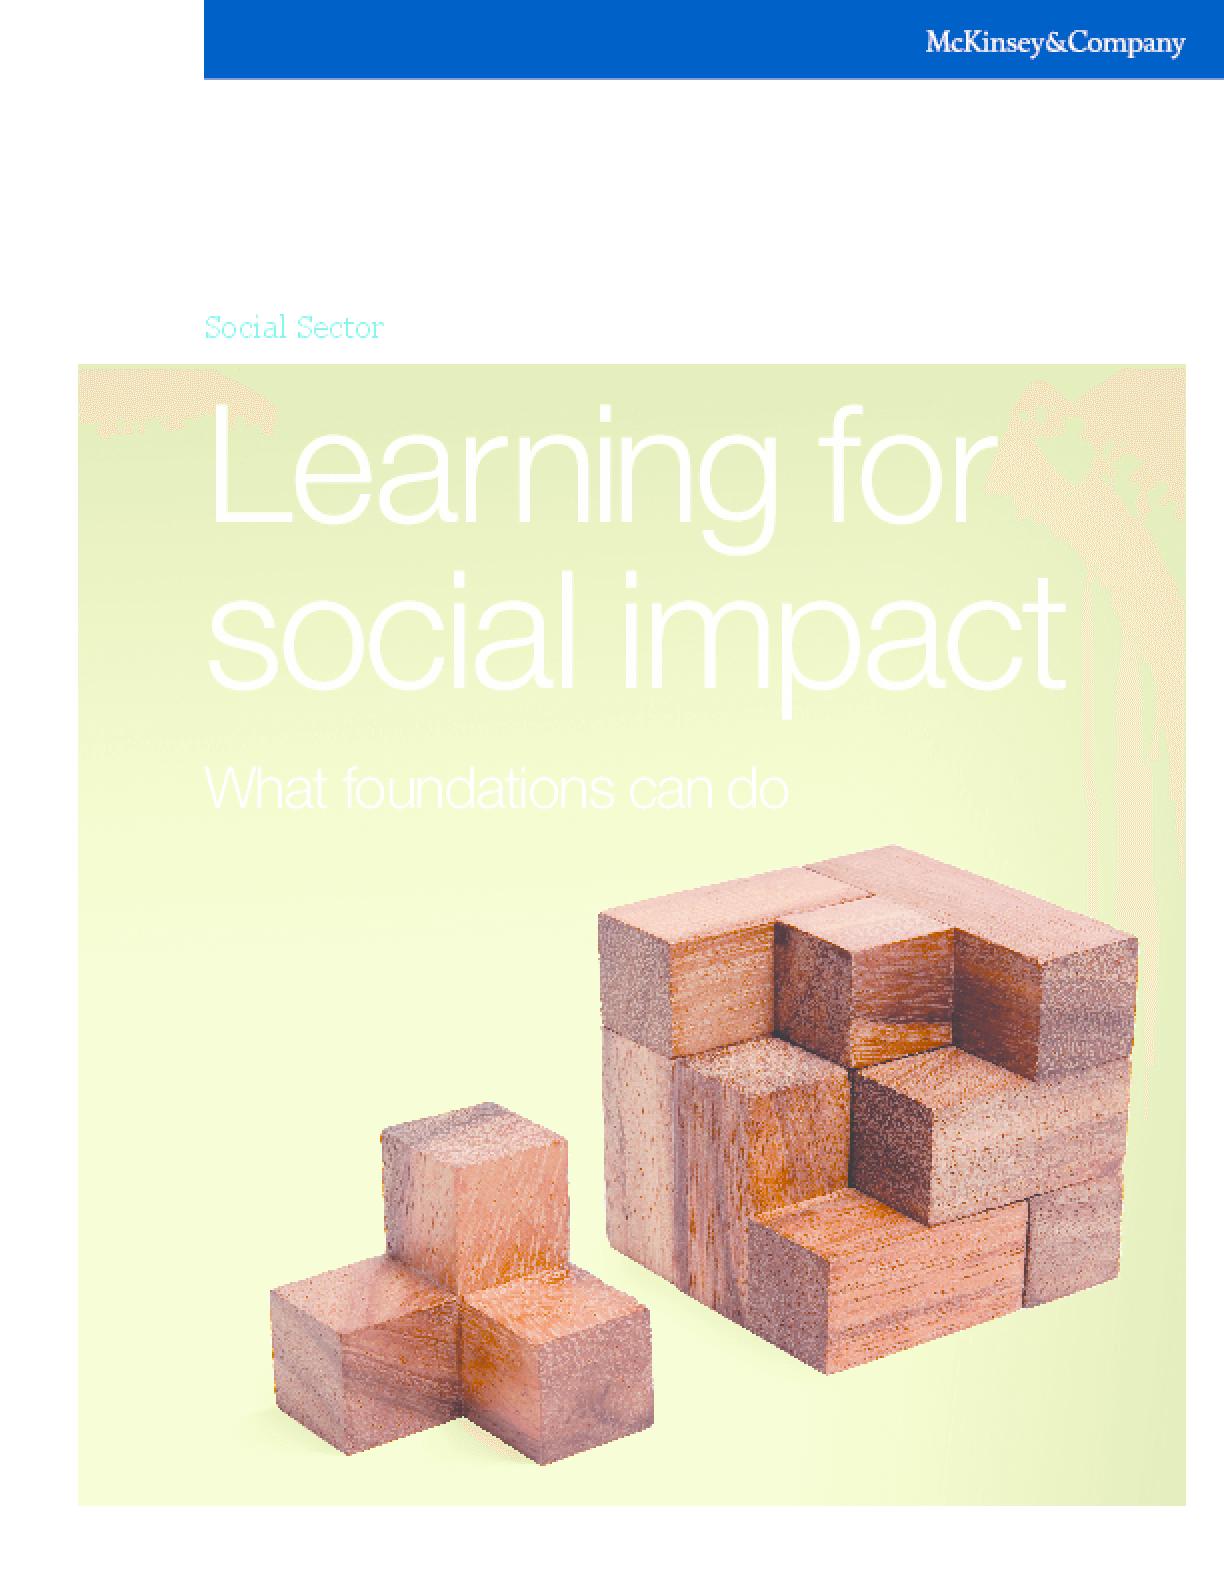 Social Impact Whitepaper